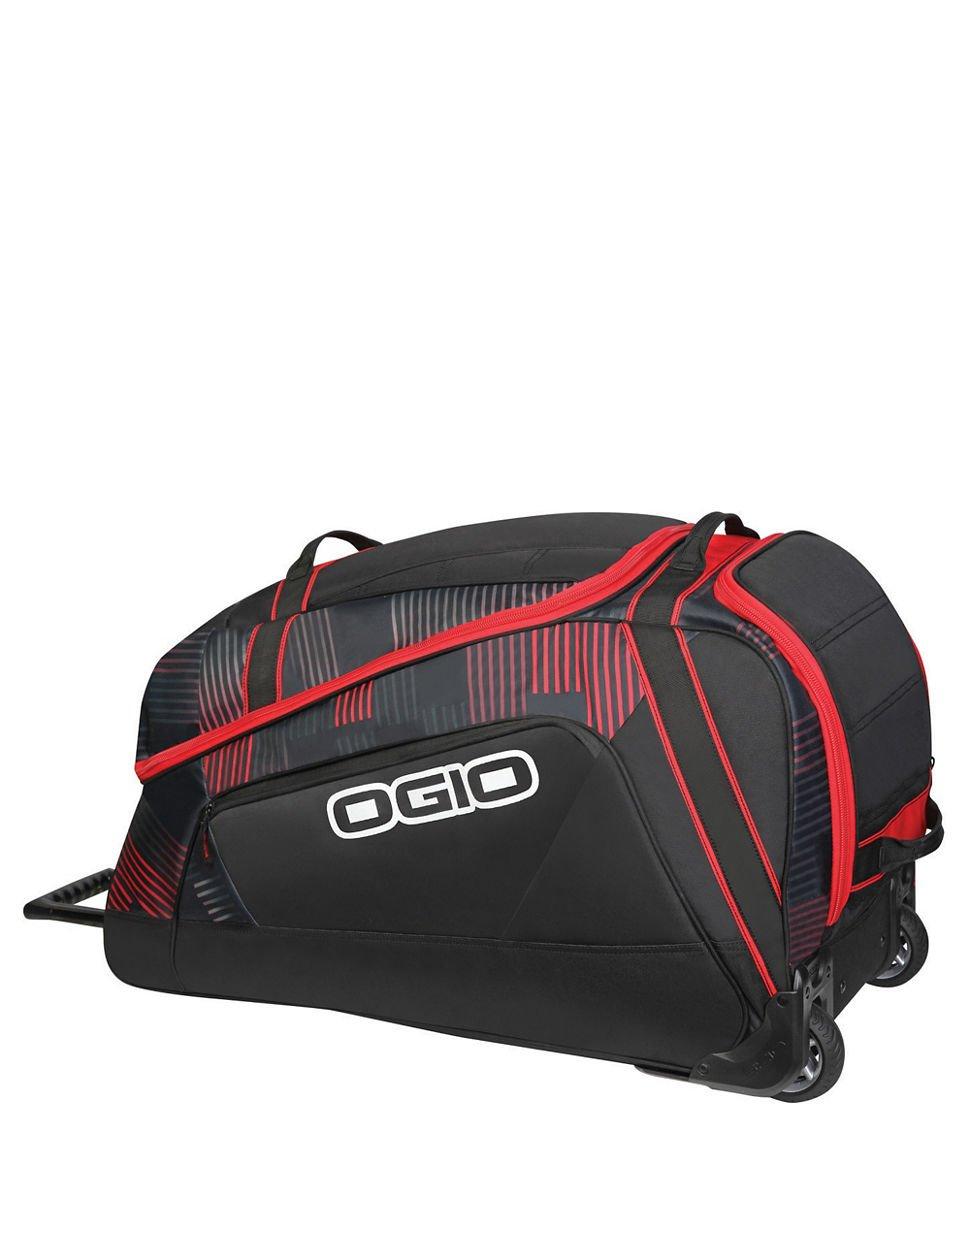 OGIO Adult Big Mouth Wheeled Travel Bag, Stoke, 31.5'' H x 16'' W x 18'' D